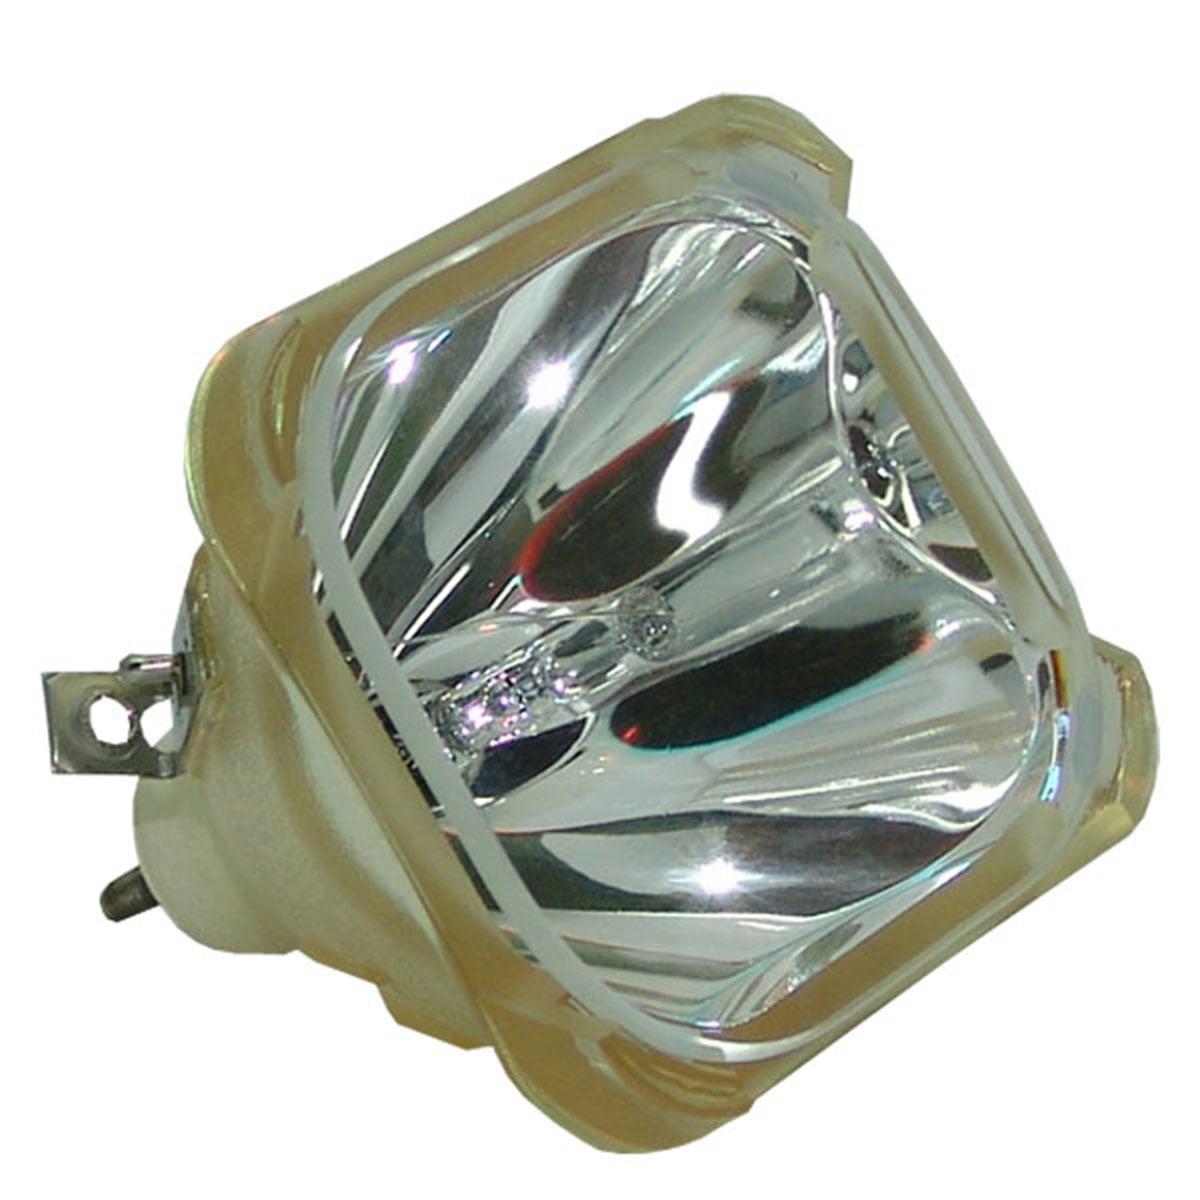 Original Philips Projector Lamp Replacement for InFocus LP690 (Bulb Only) - image 1 de 5